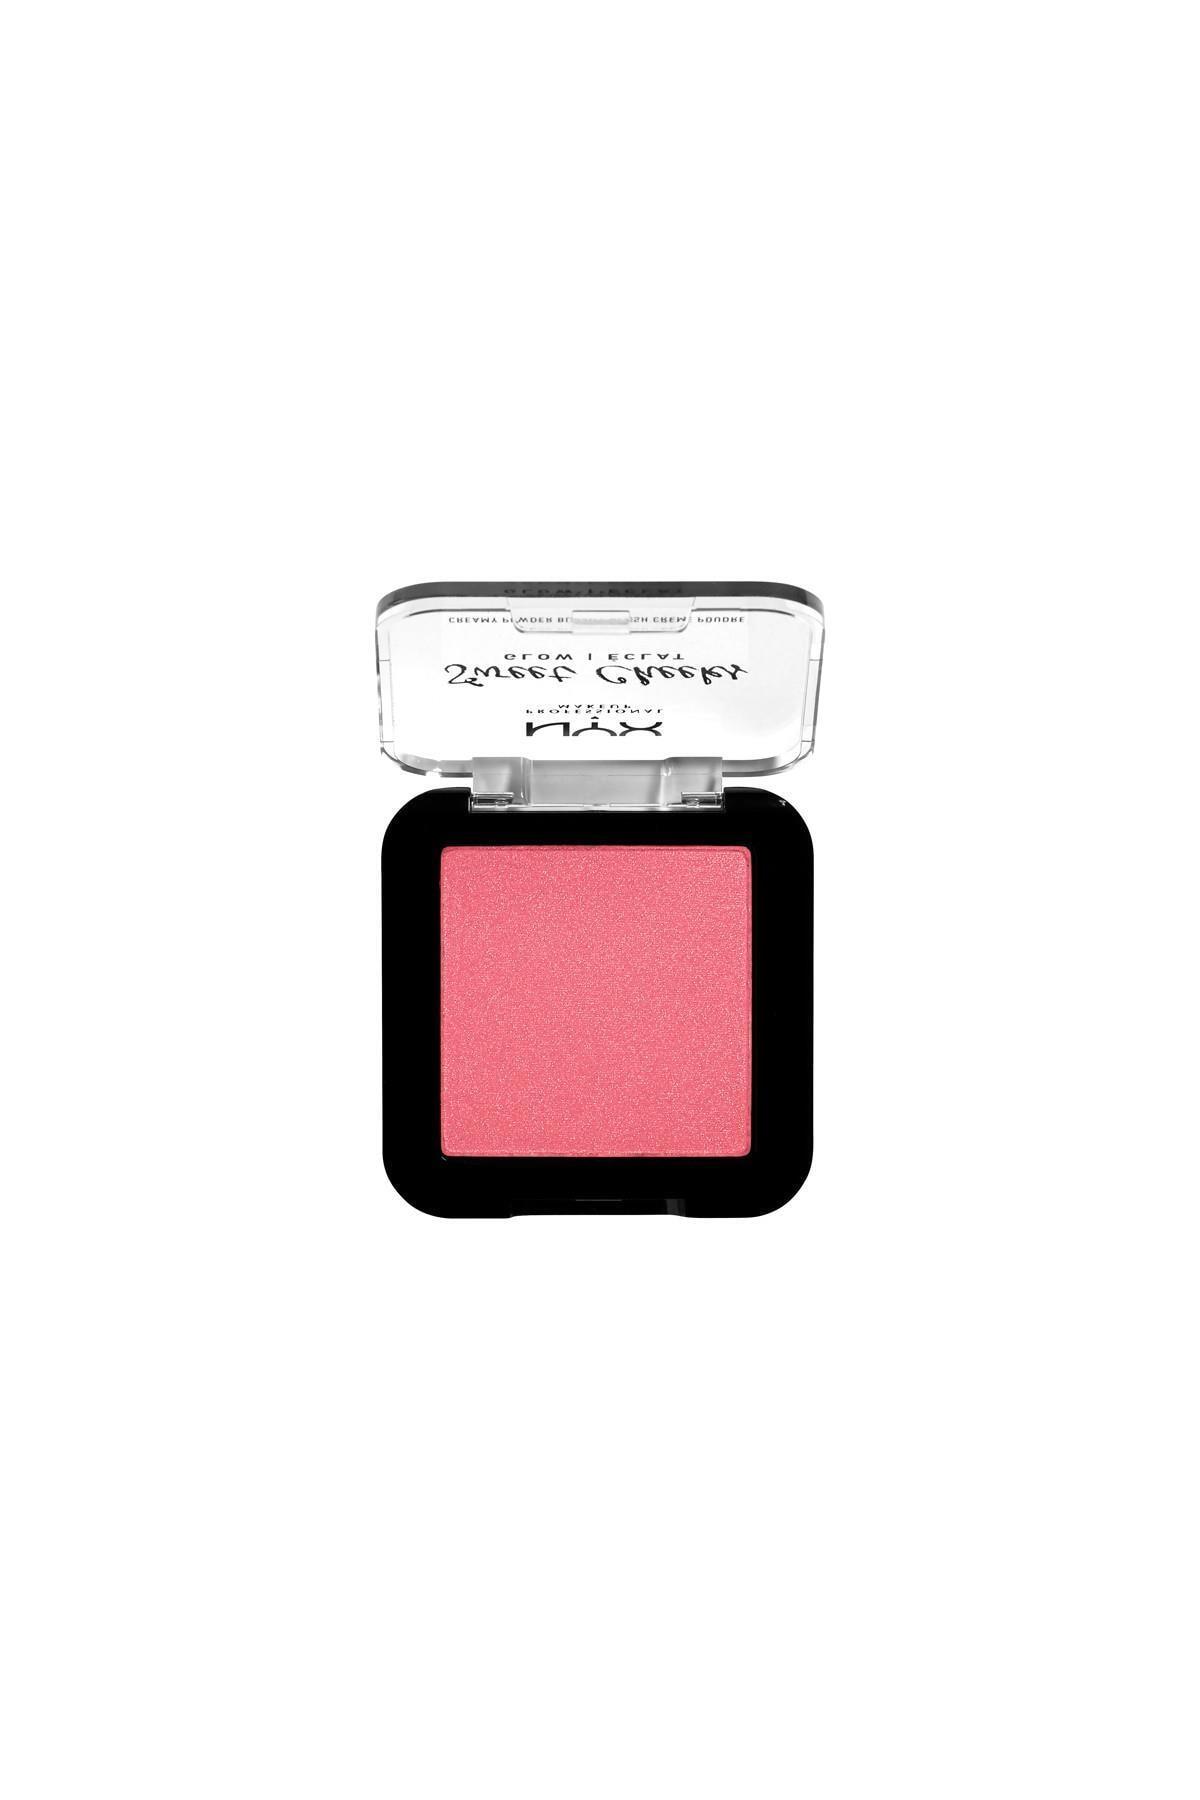 NYX Professional Makeup Işıltı Veren Allık - Sweet Cheeks Creamy Powder Blush Glow - Day Dream 800897192396 0